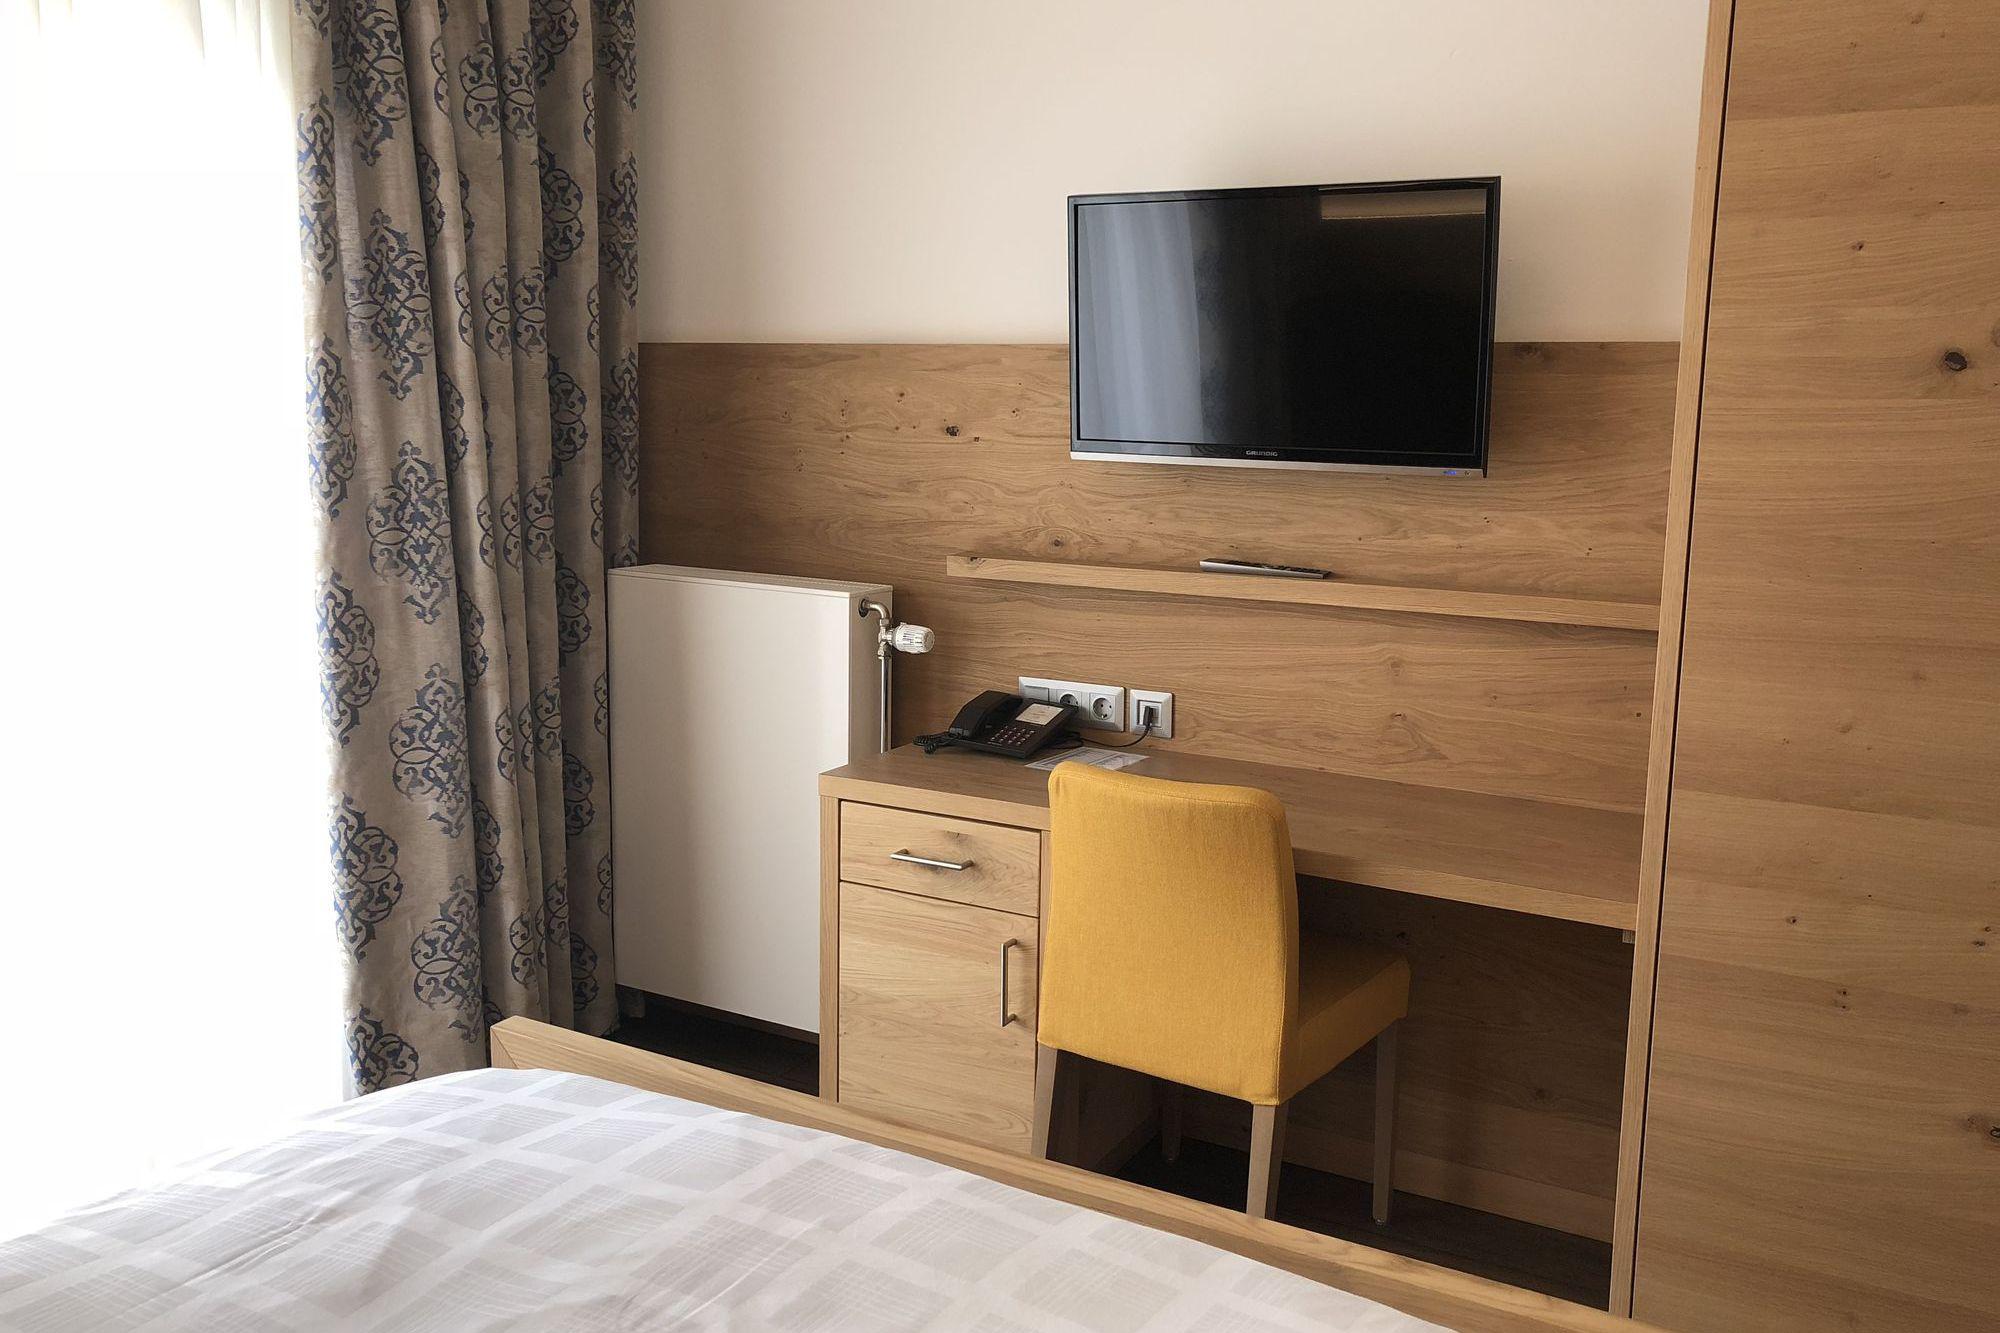 https://www.hotelbinder.de/wp-content/uploads/einzelzimmer2_2.jpg